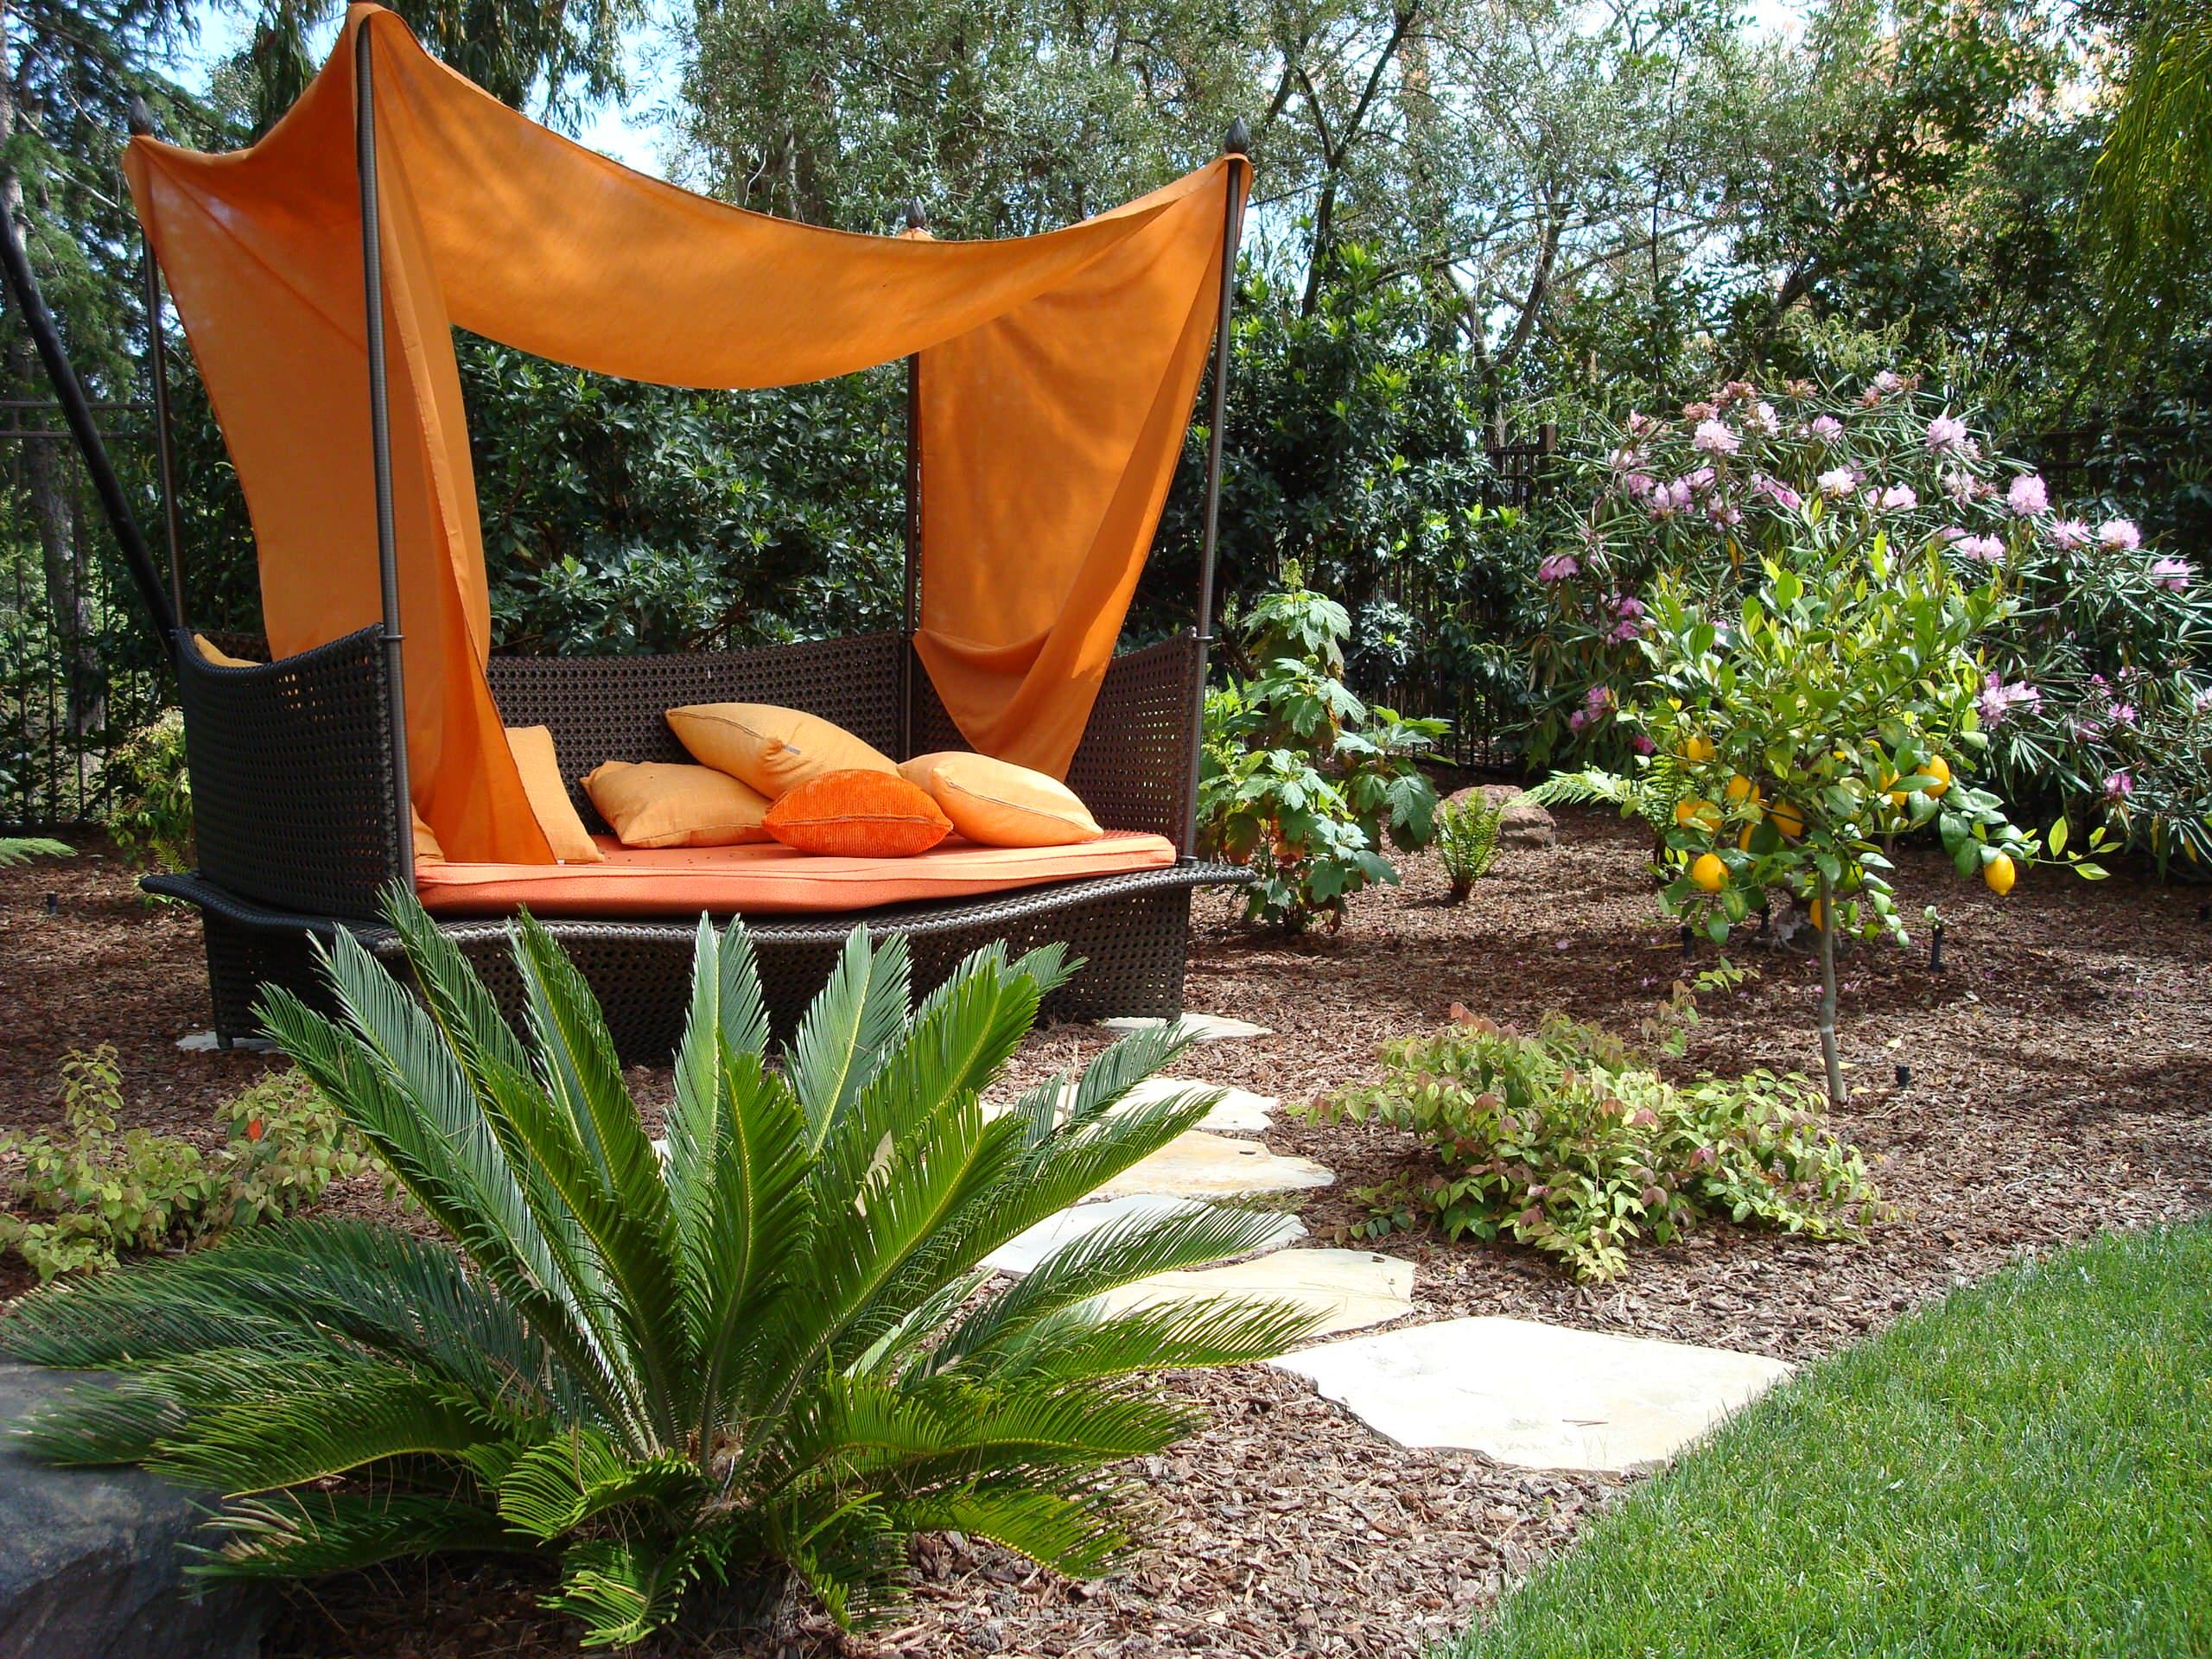 Garden Ideas Small Landscape Gardens Pictures Gallery: 16 Delightful Modern Landscape Ideas That Will Update Your